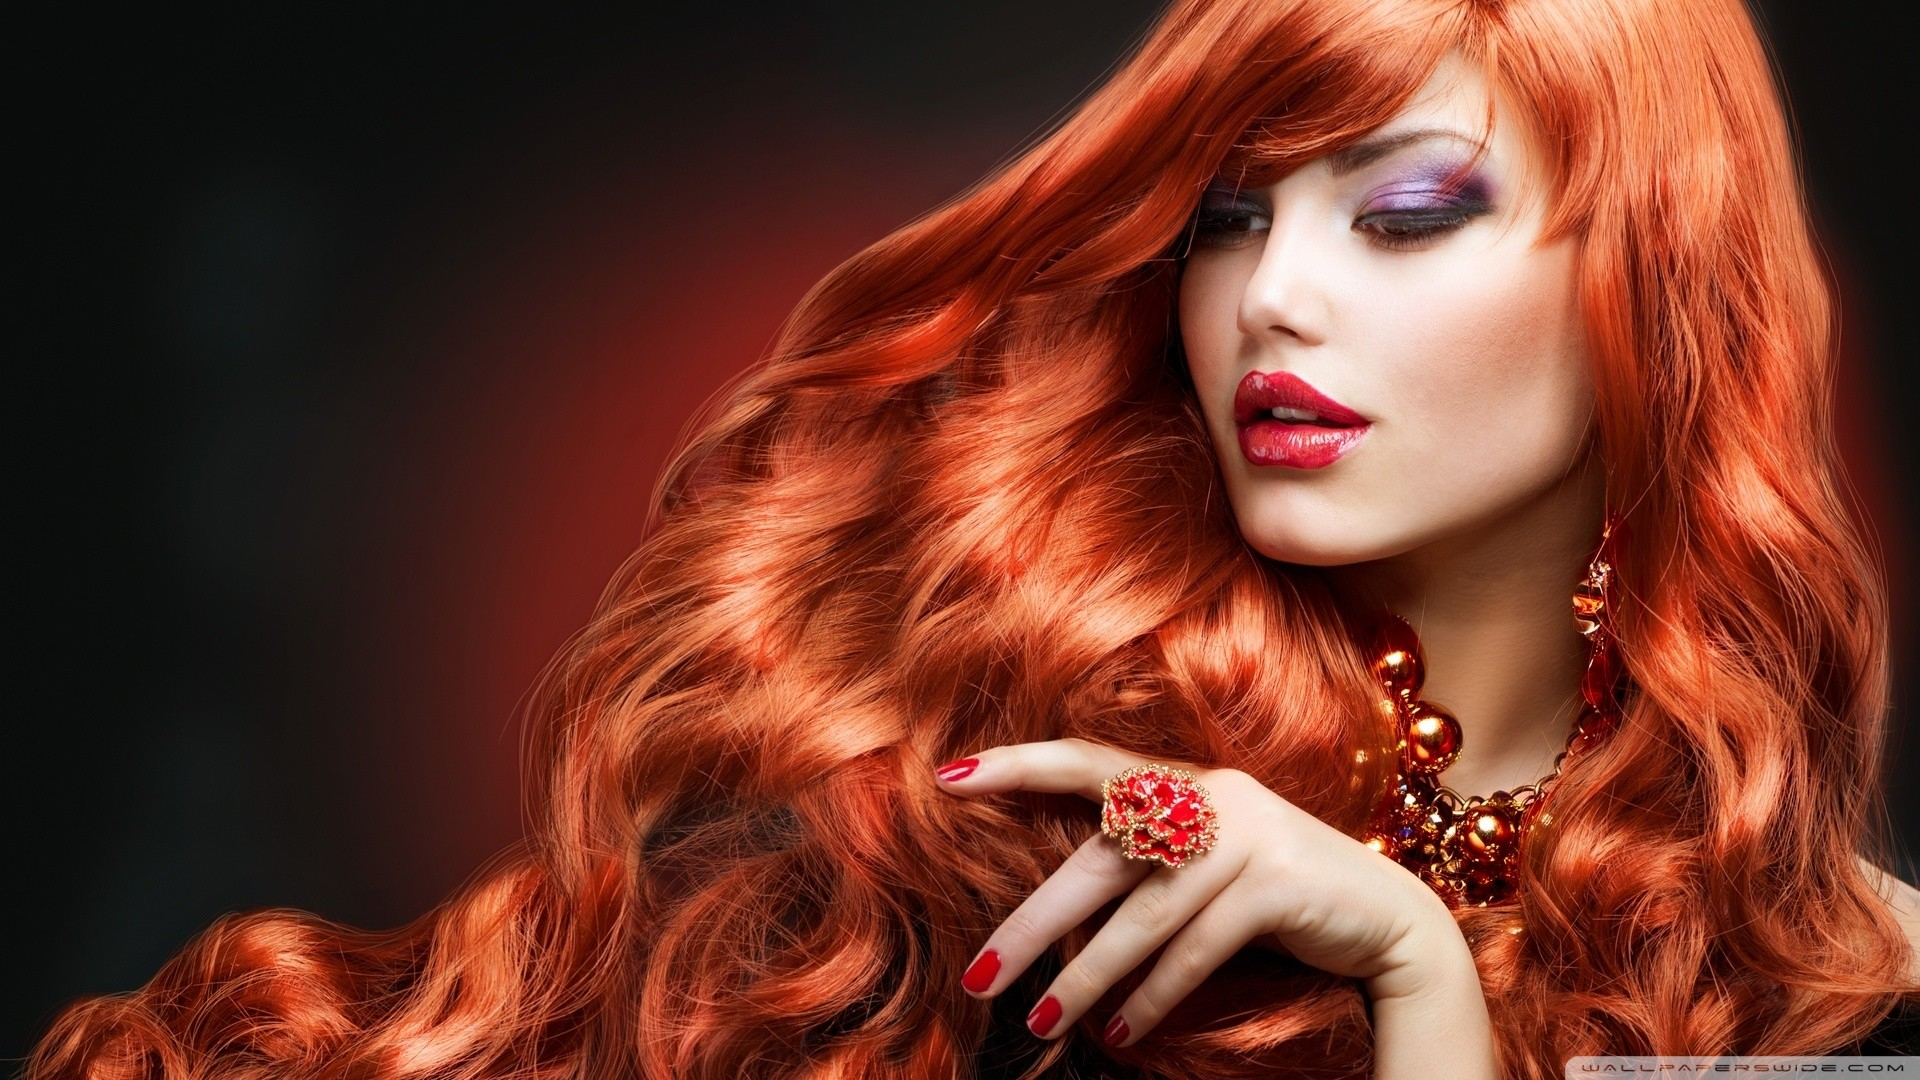 Hair Salon Wallpaper 56 Images